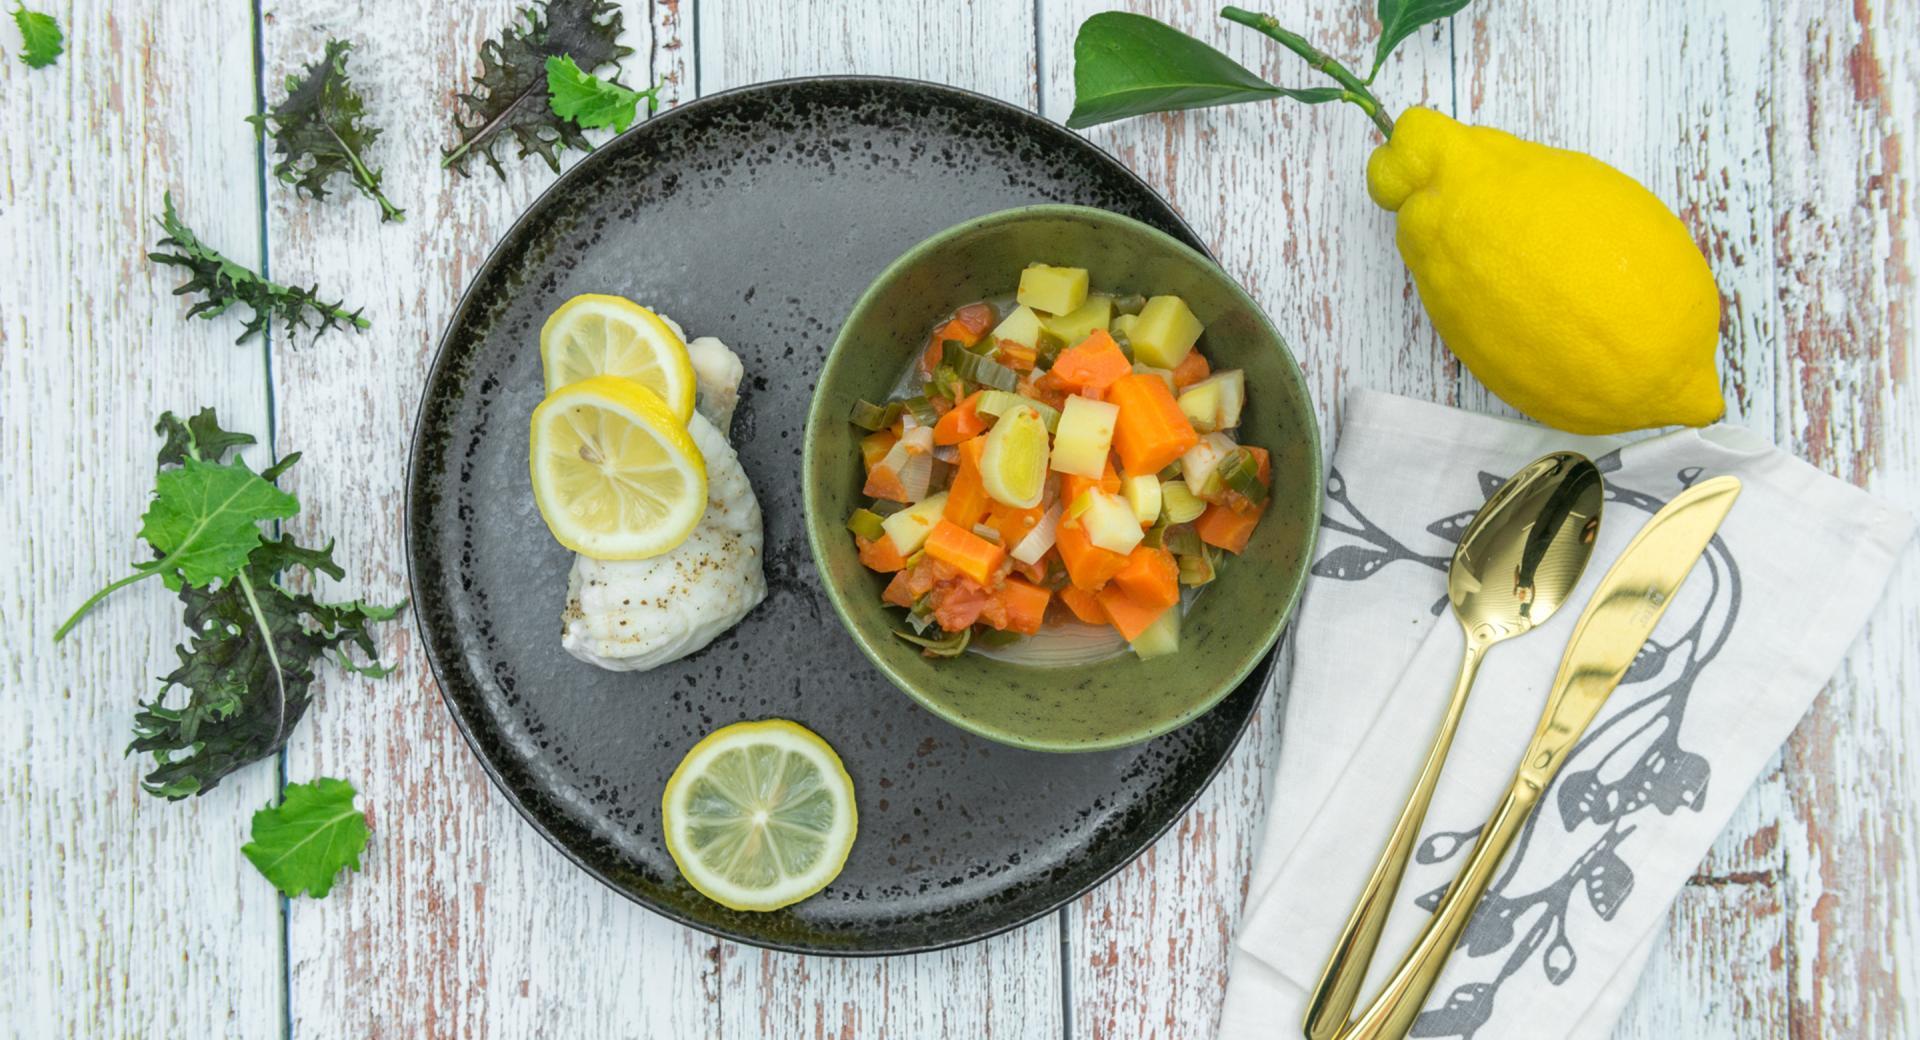 Filete de pescado con verduras al vapor